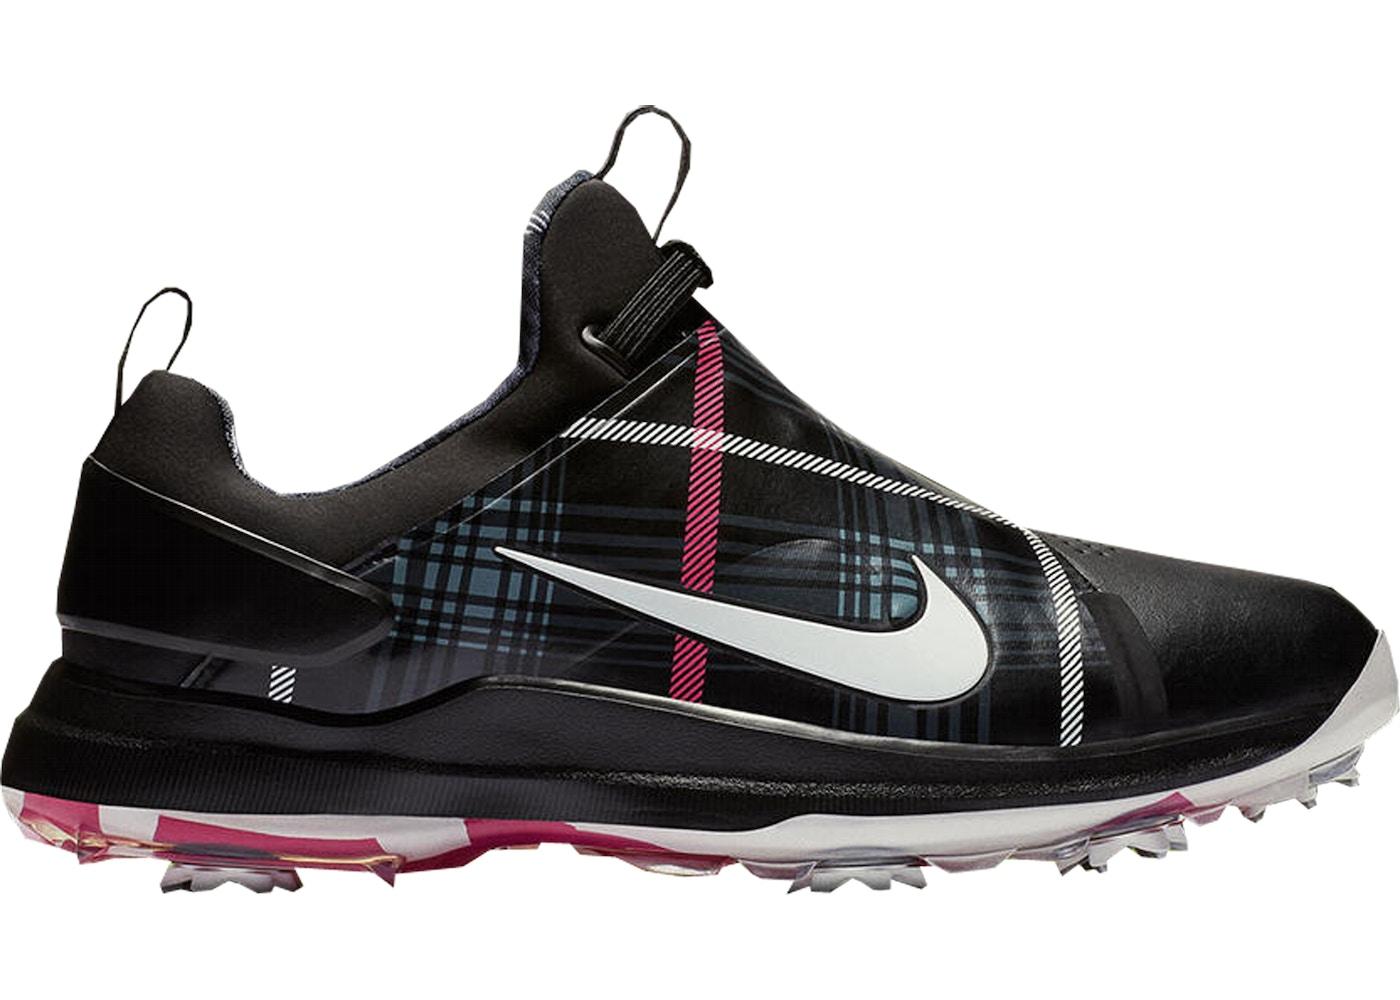 nike golf tour premiere car nasty pe sneakers. Black Bedroom Furniture Sets. Home Design Ideas